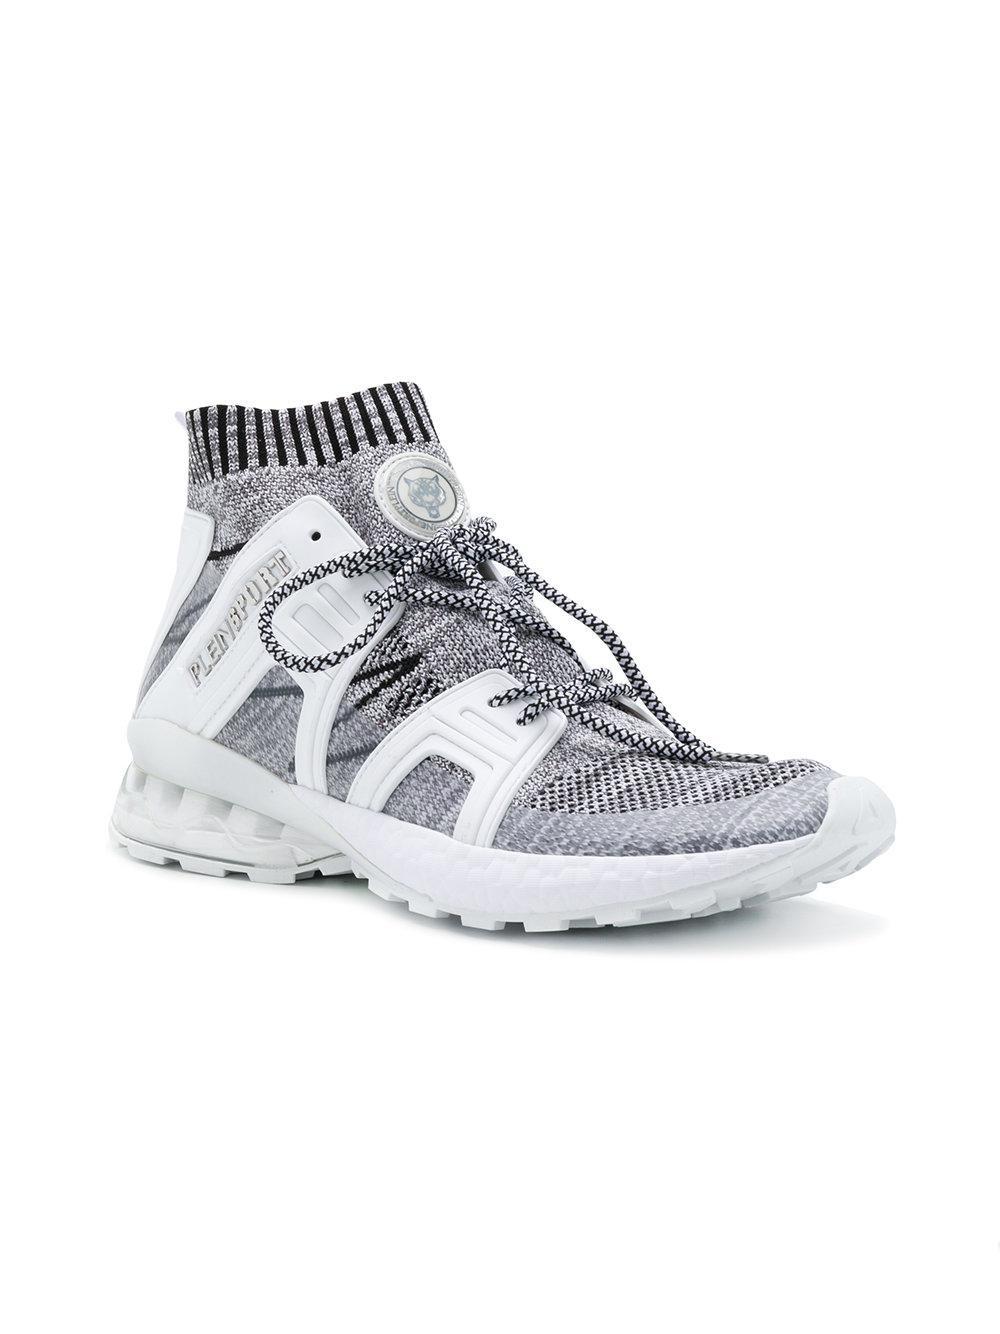 Philipp Plein Sock sneakers hfFPp